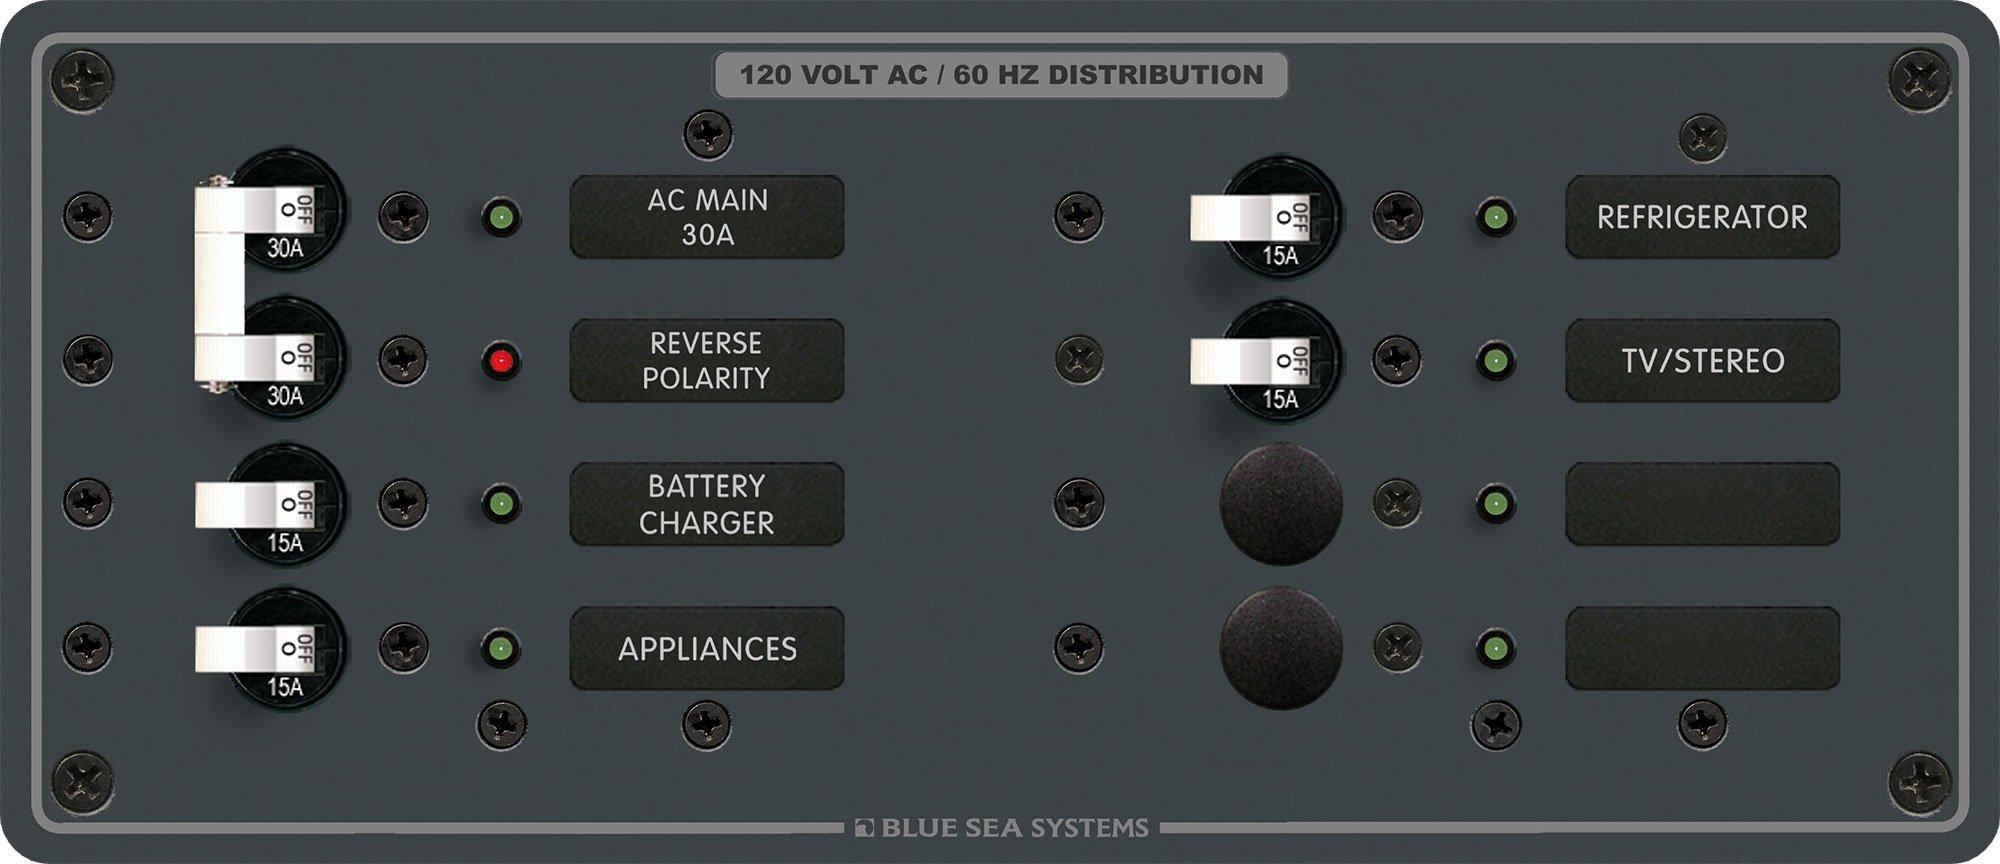 AC Main + 6 Positions